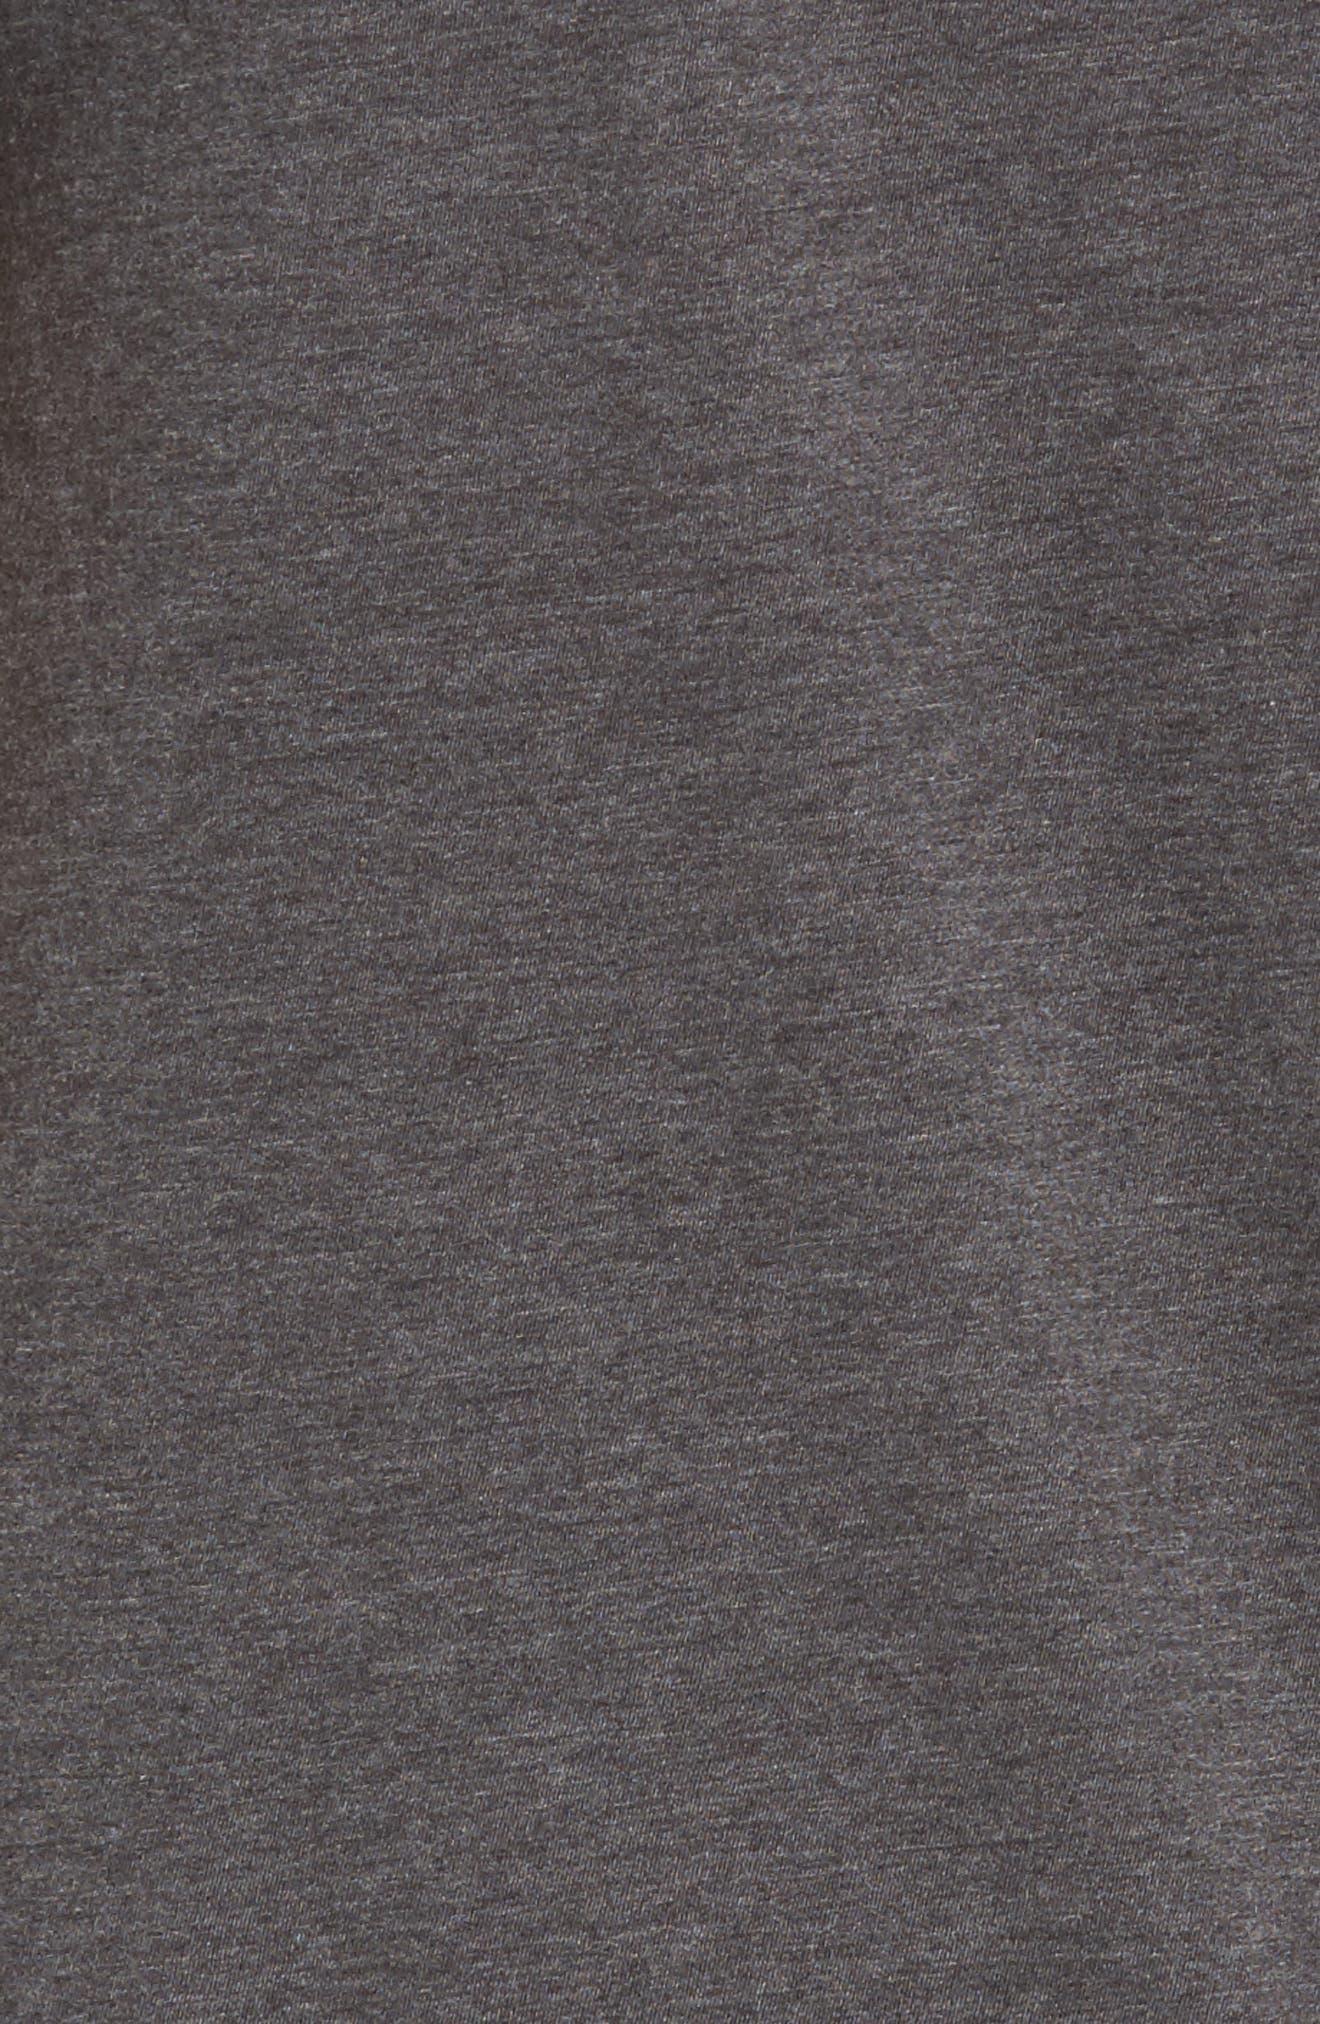 Suzuki Sign Graphic T-Shirt,                             Alternate thumbnail 5, color,                             001